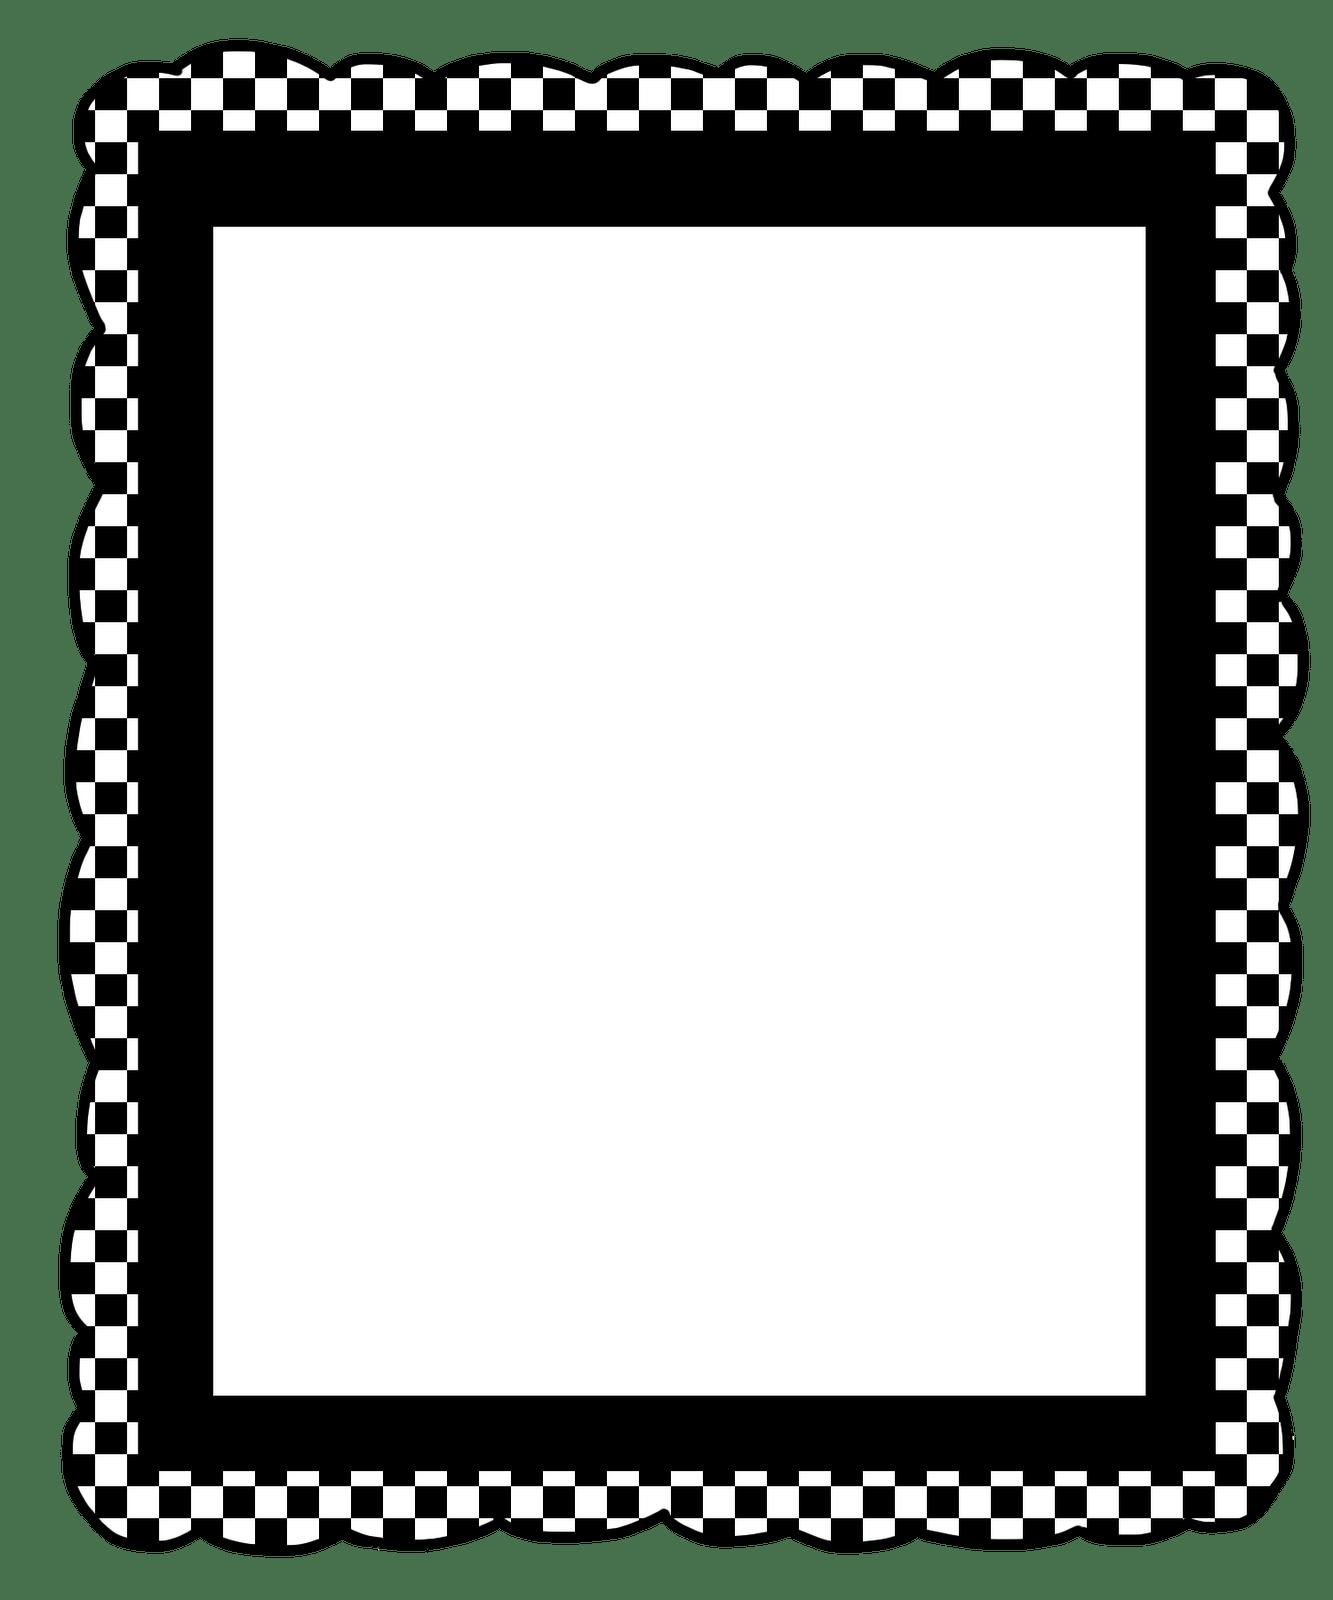 Halloween Clip Art Black And White Border